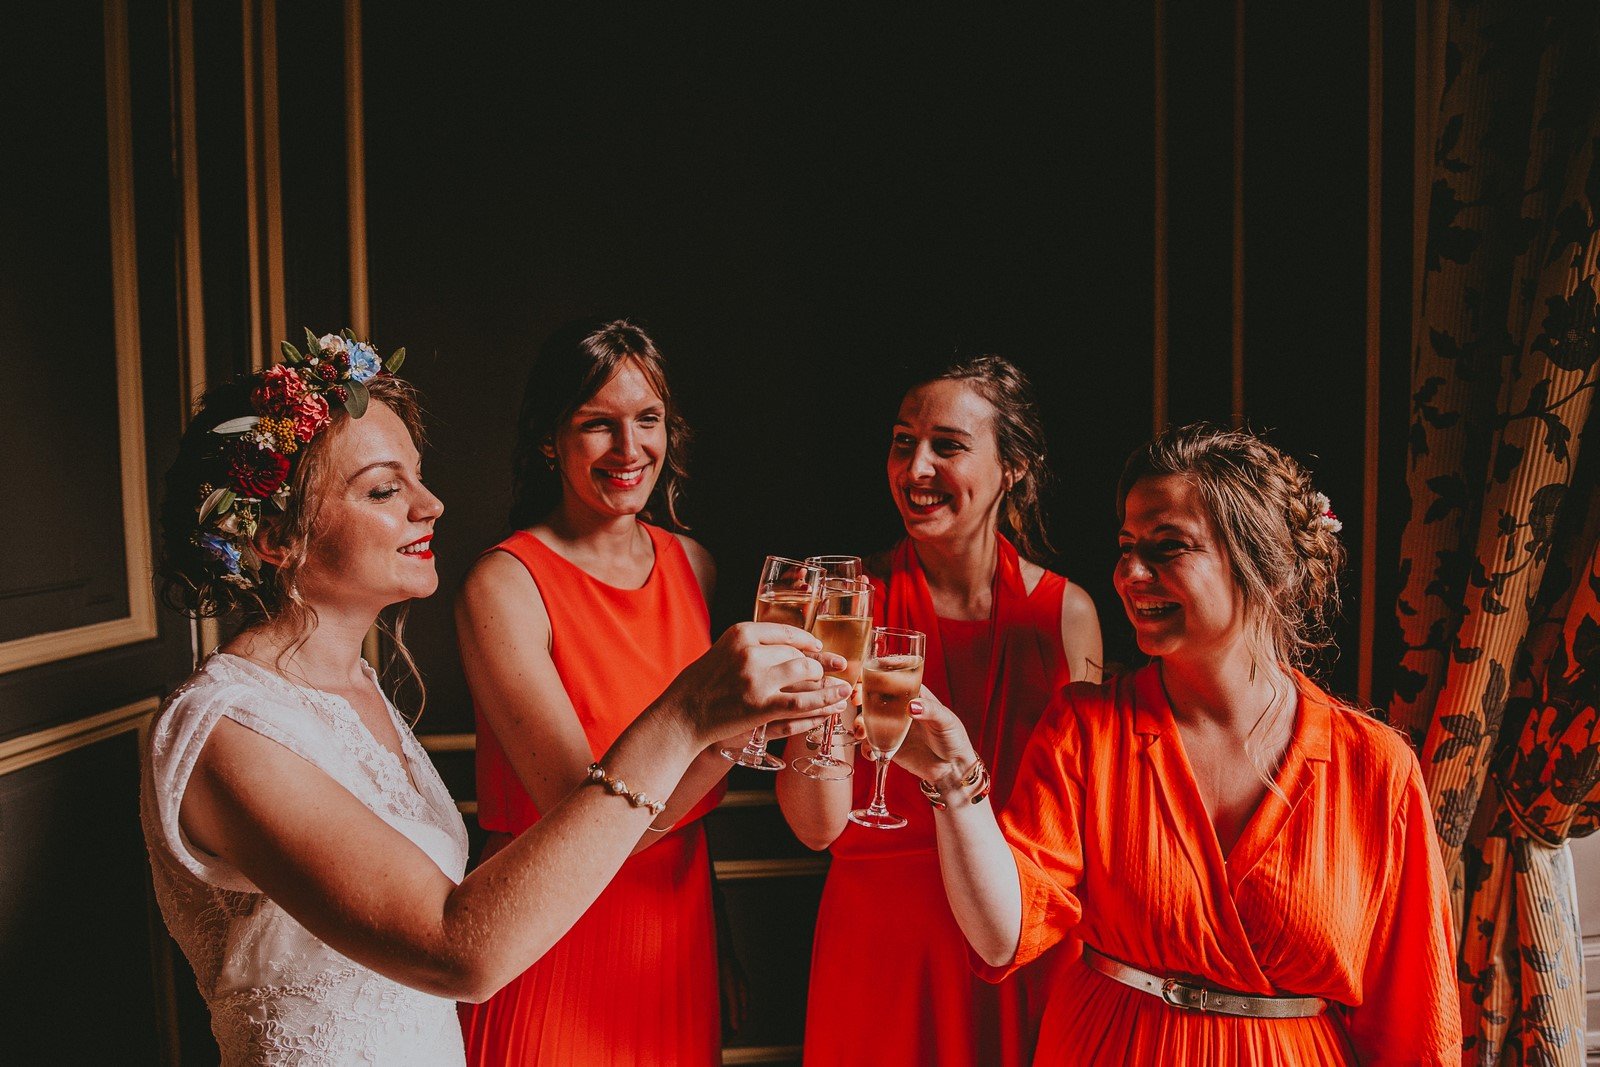 photographe mariage chateau de bourgogne 26